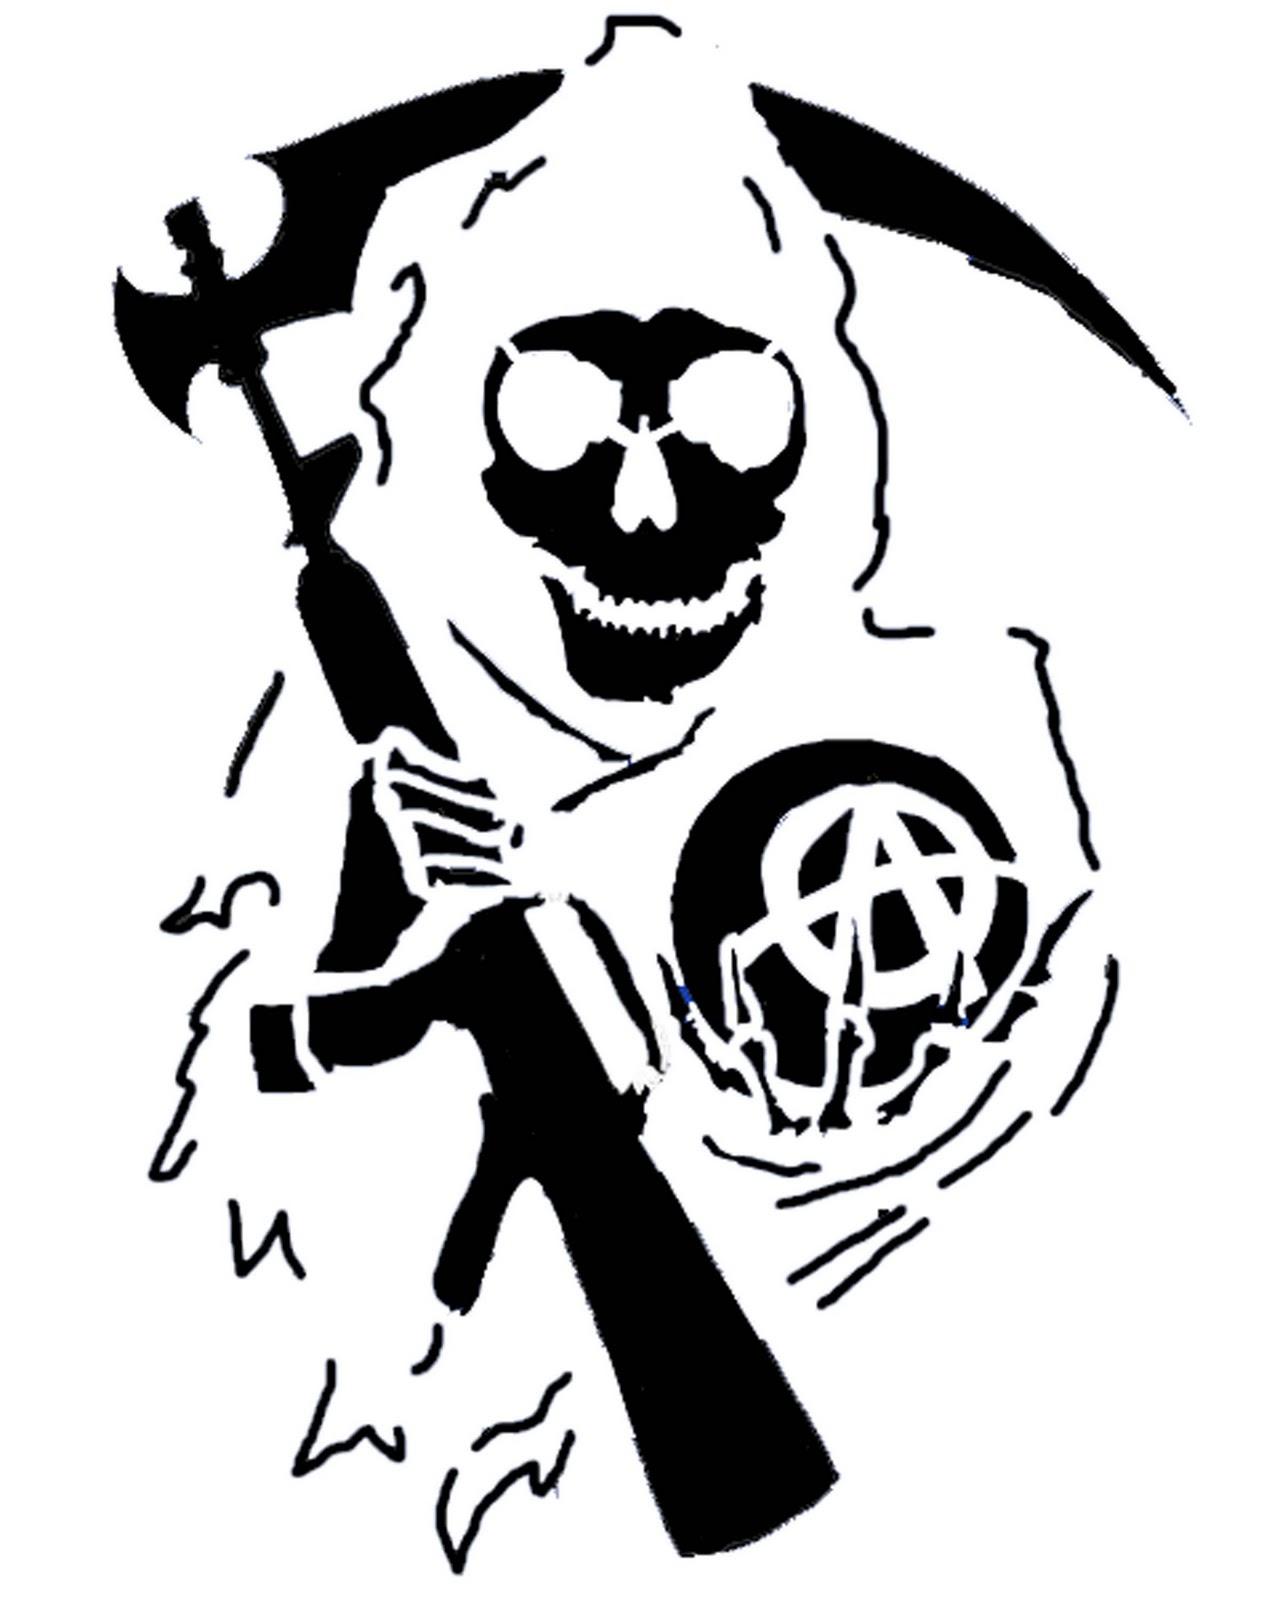 Grim Reaper Pumpkin Stencil Halloween Pumpkin Stencil Halloween